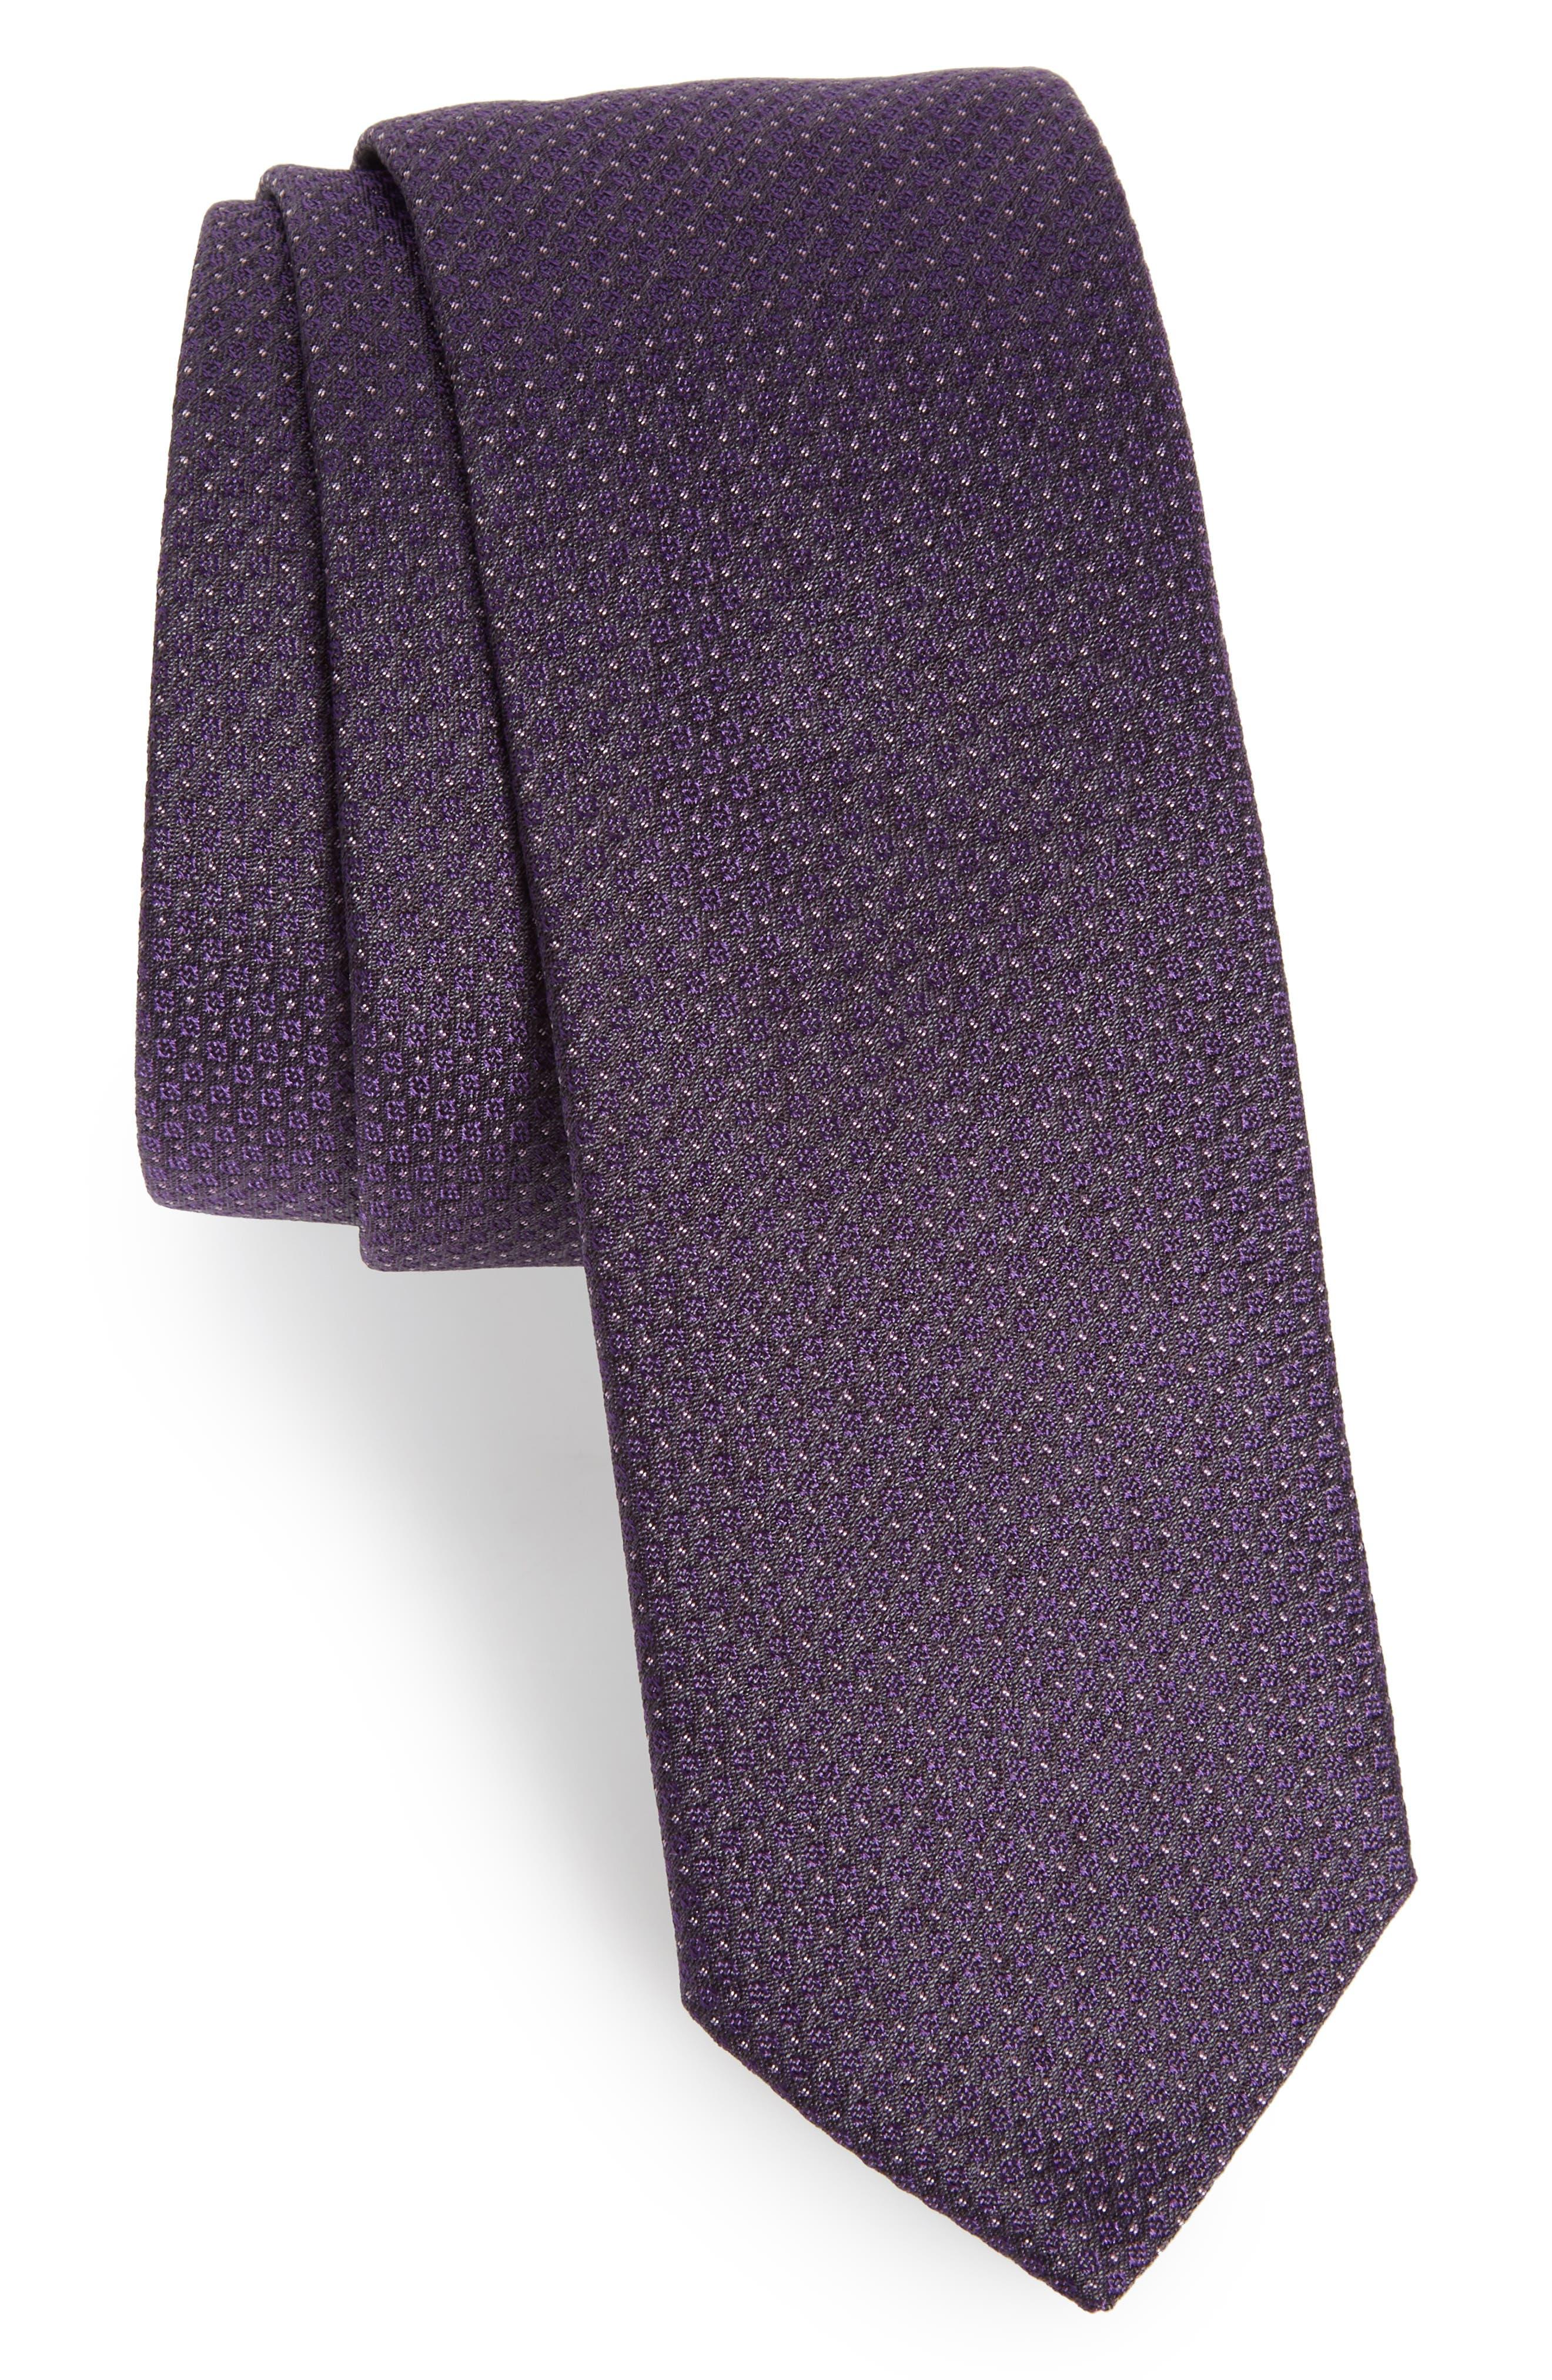 Main Image - BOSS Dot Silk Tie